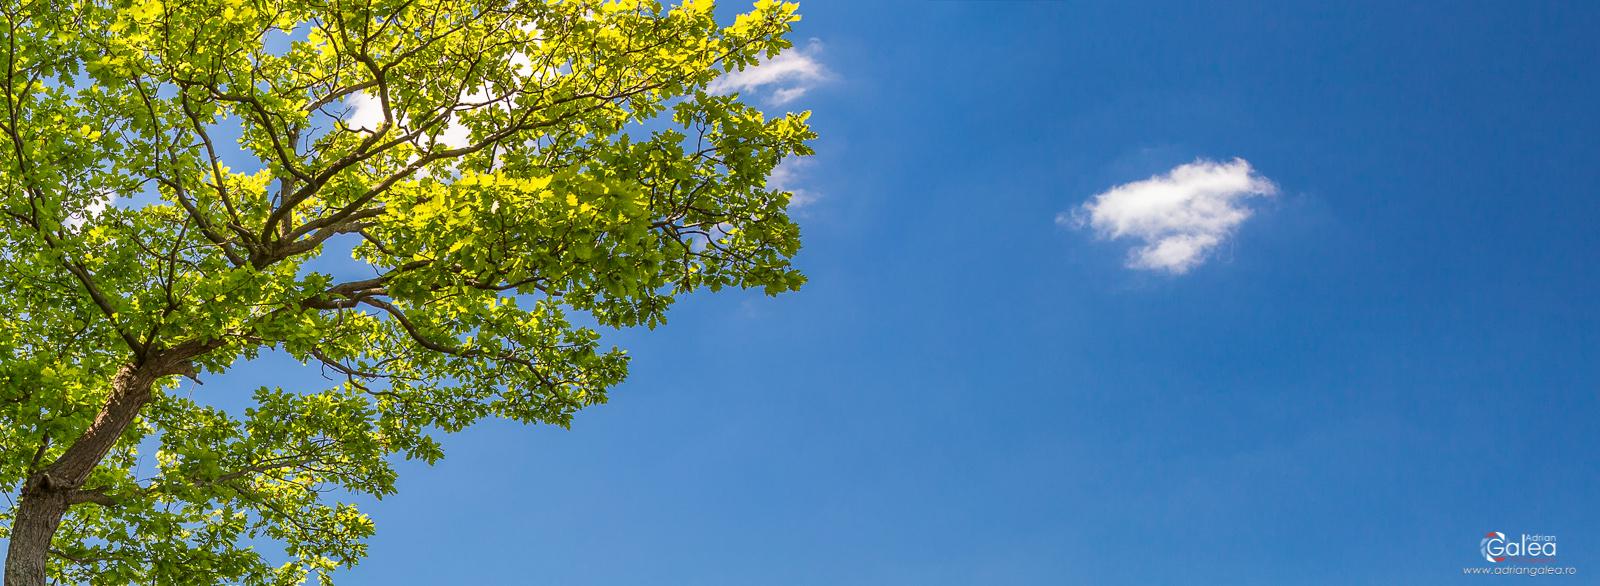 Eifel Park Tree